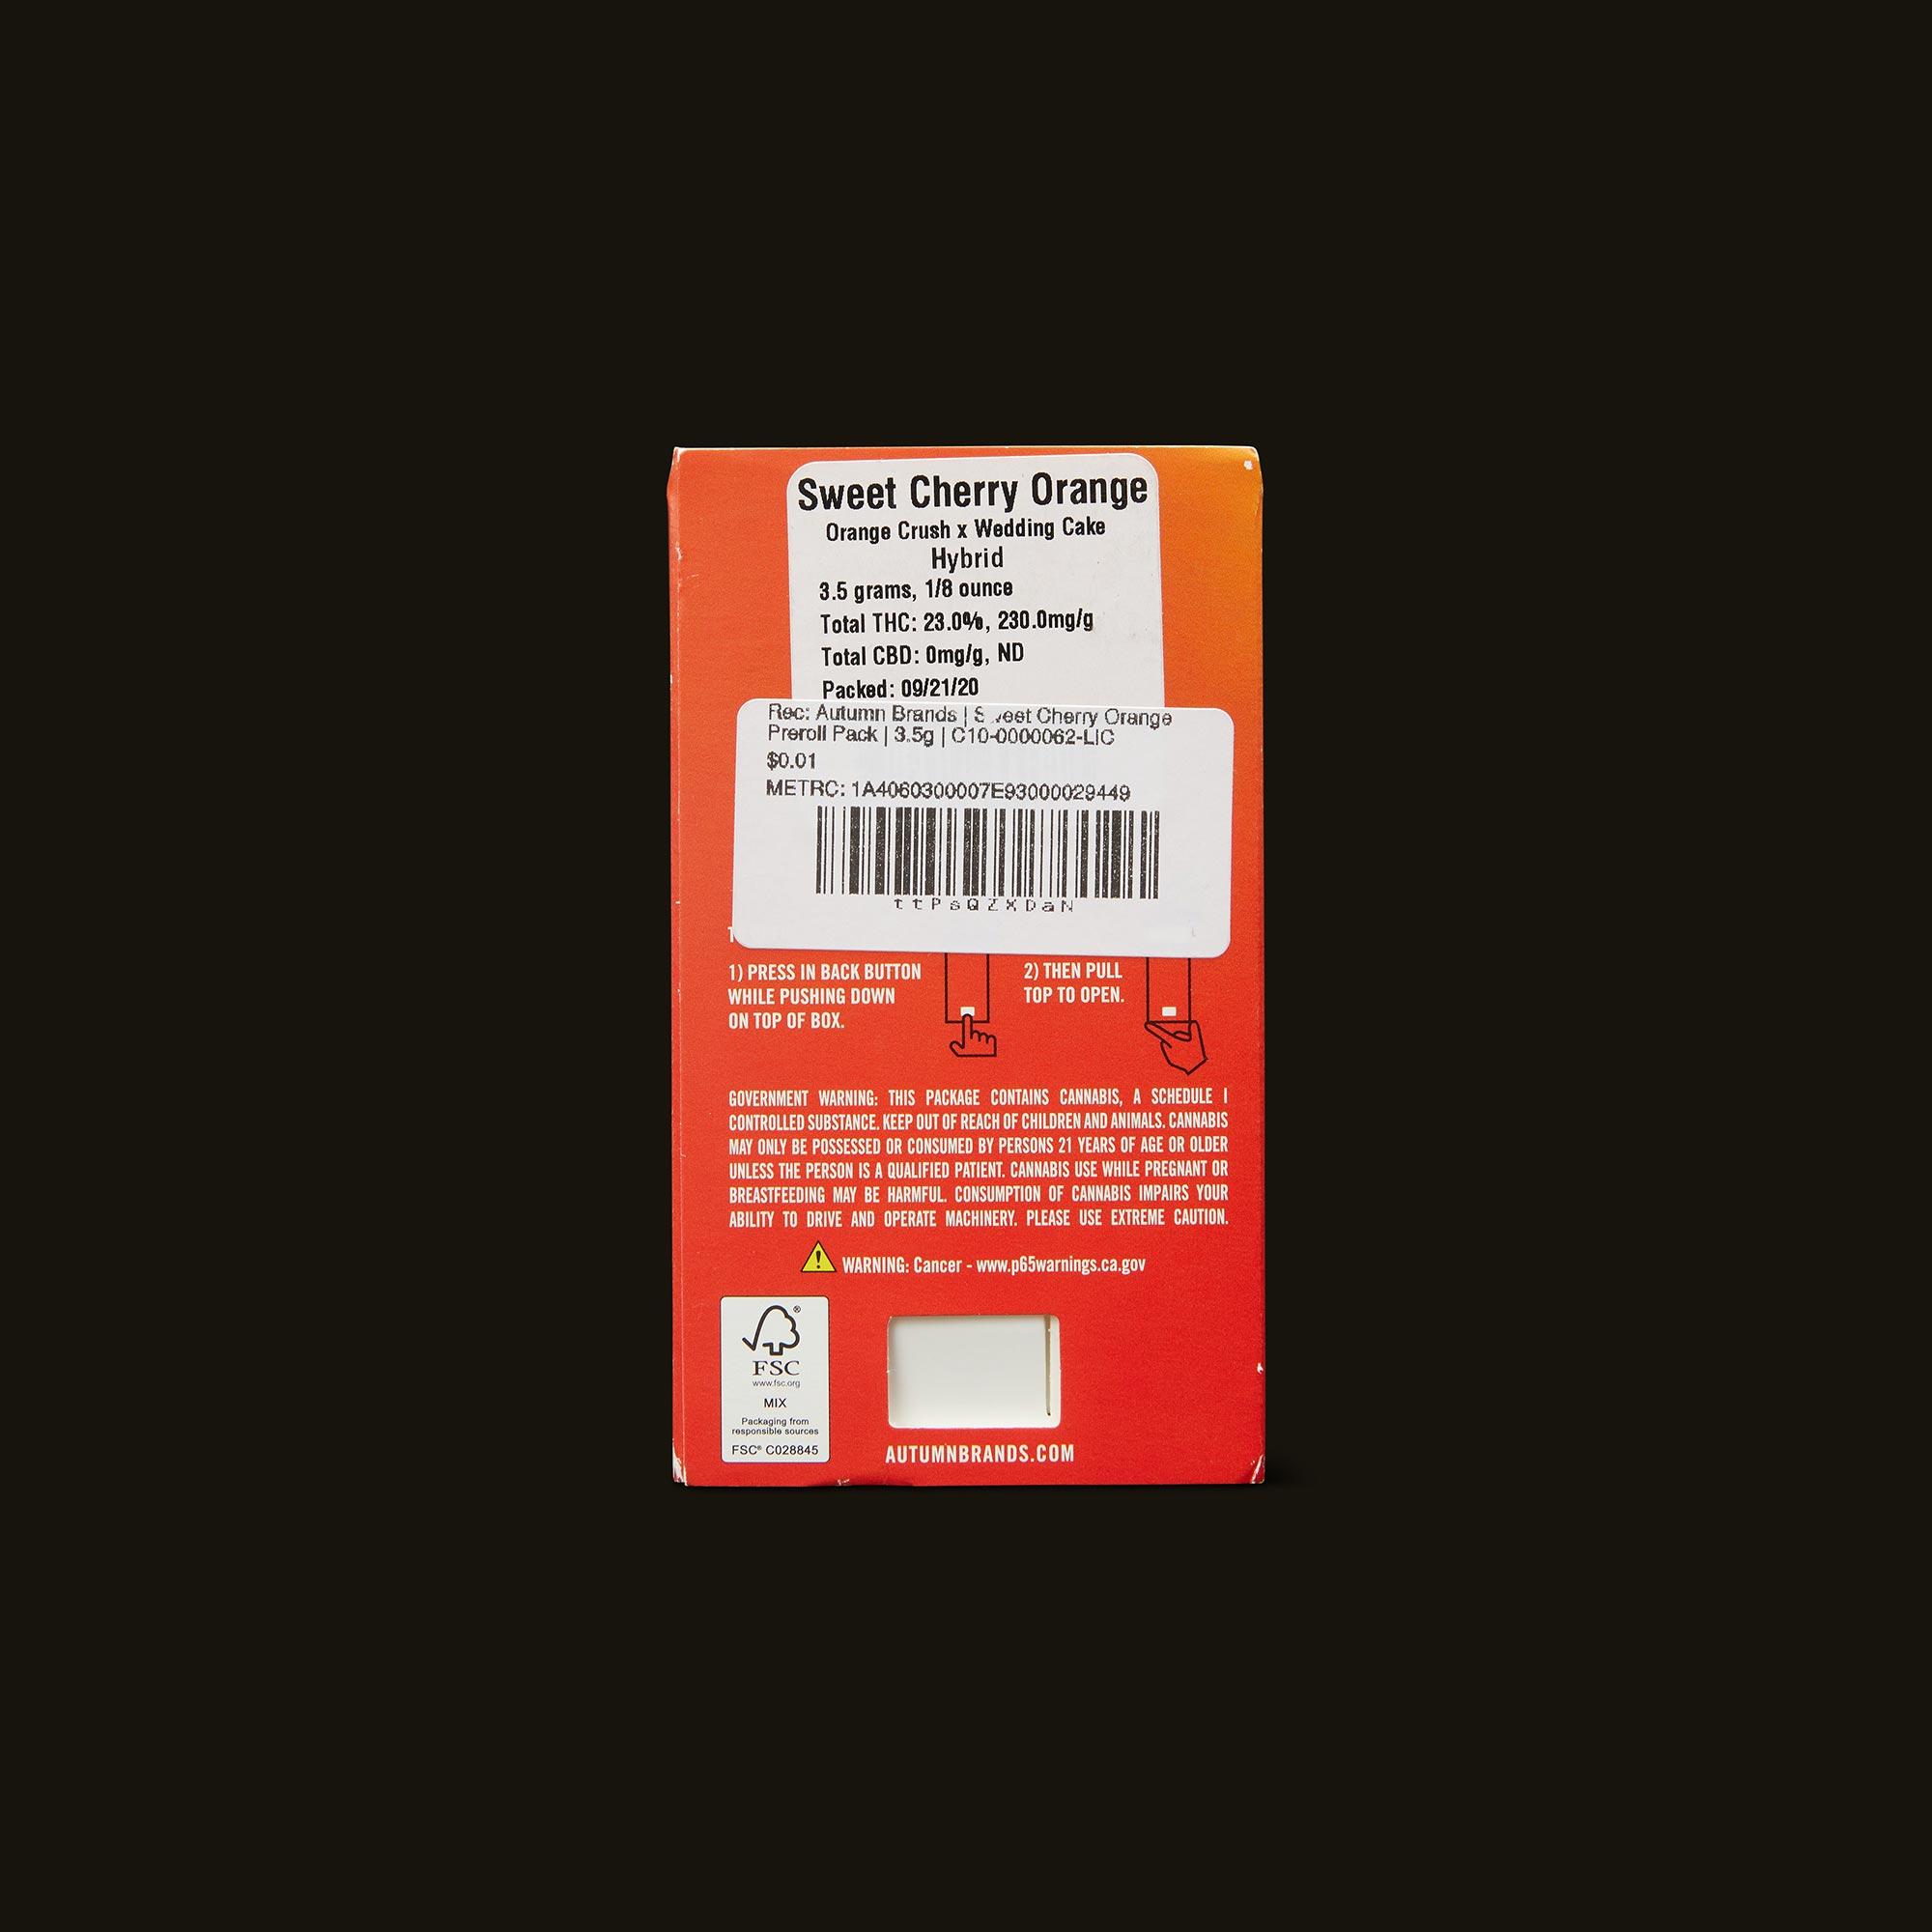 Autumn Brands Sweet Cherry Orange Pack Back Packaging